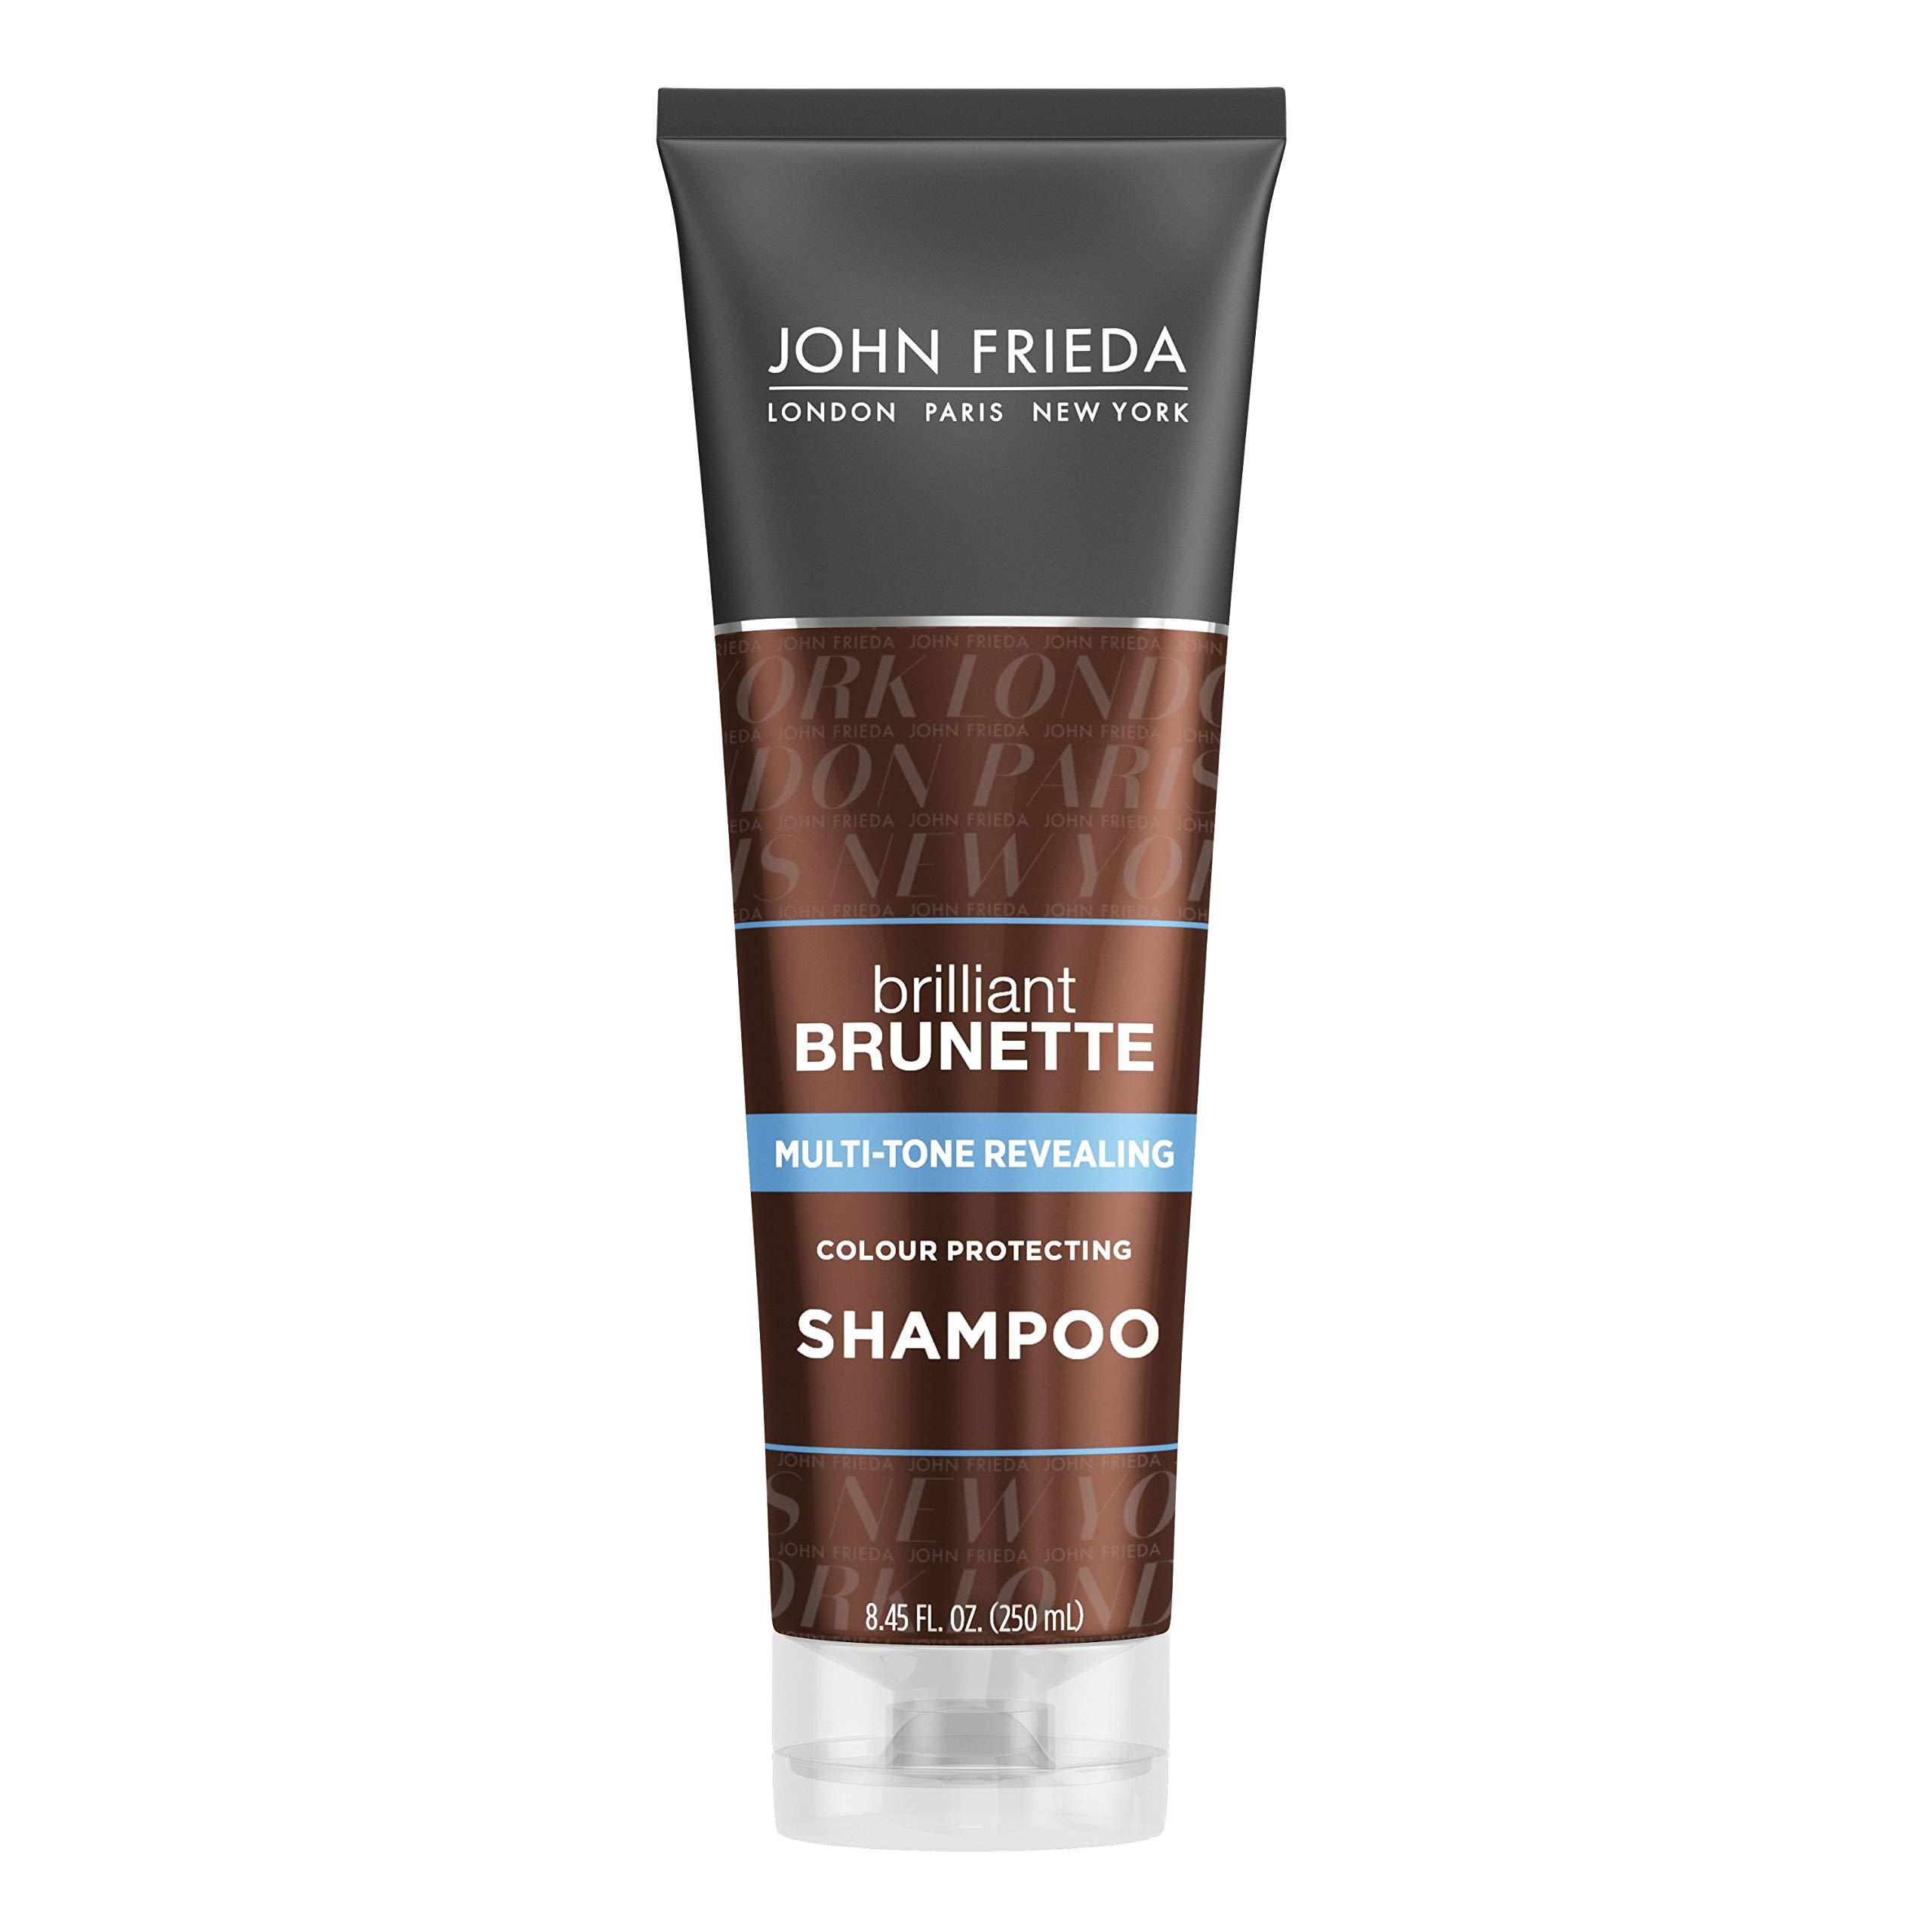 John Frieda Brilliant Brunette Multi-Tone Revealing Shampoo, Color Protecting Shampoo, Helps Unlock Vibrant Color, 8.45 Ounce